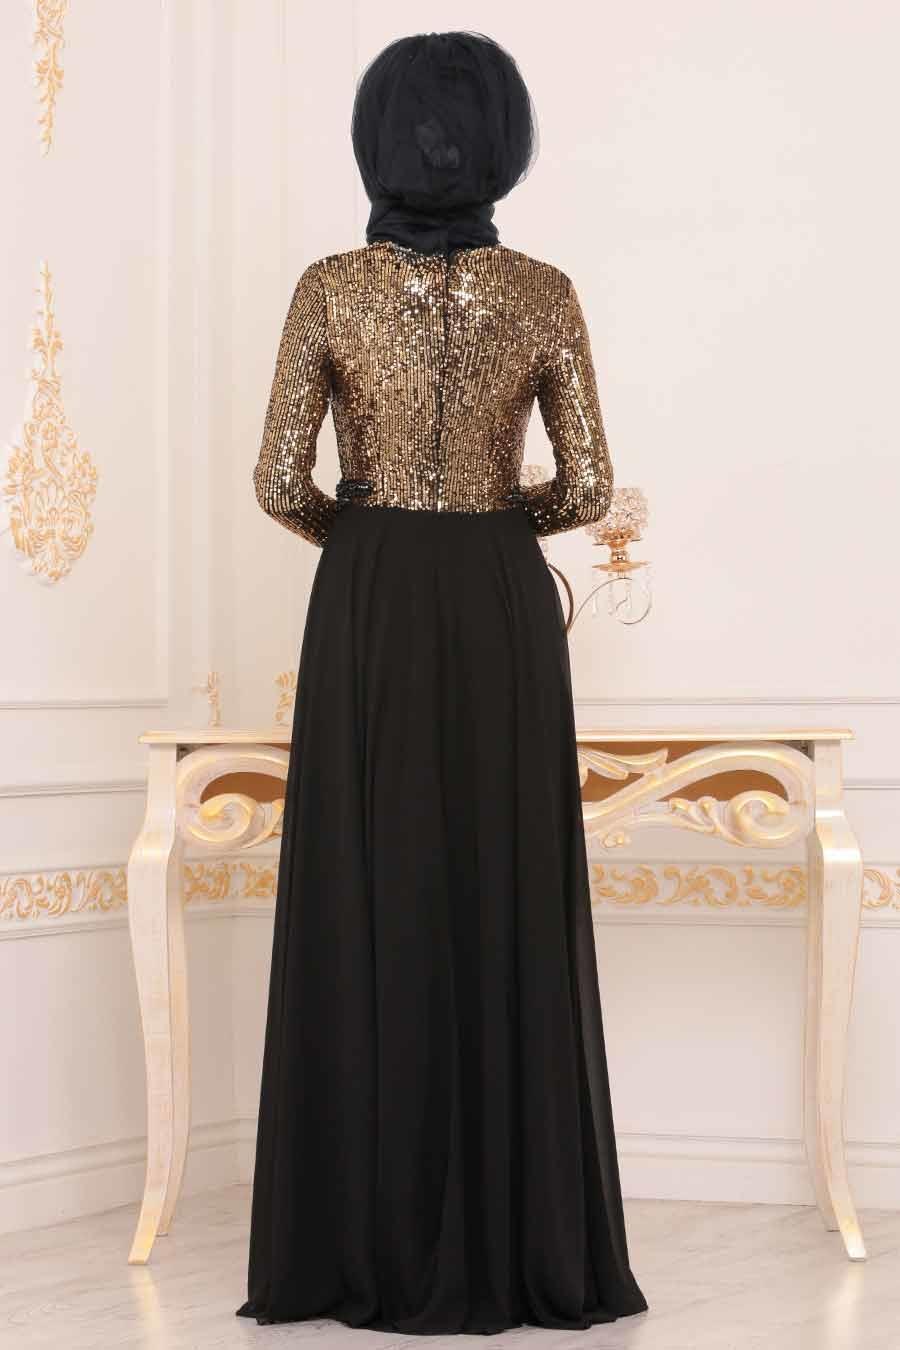 Nayla Collection - Pul Payetlli Gold Tesettür Abiye Elbise 25746GOLD